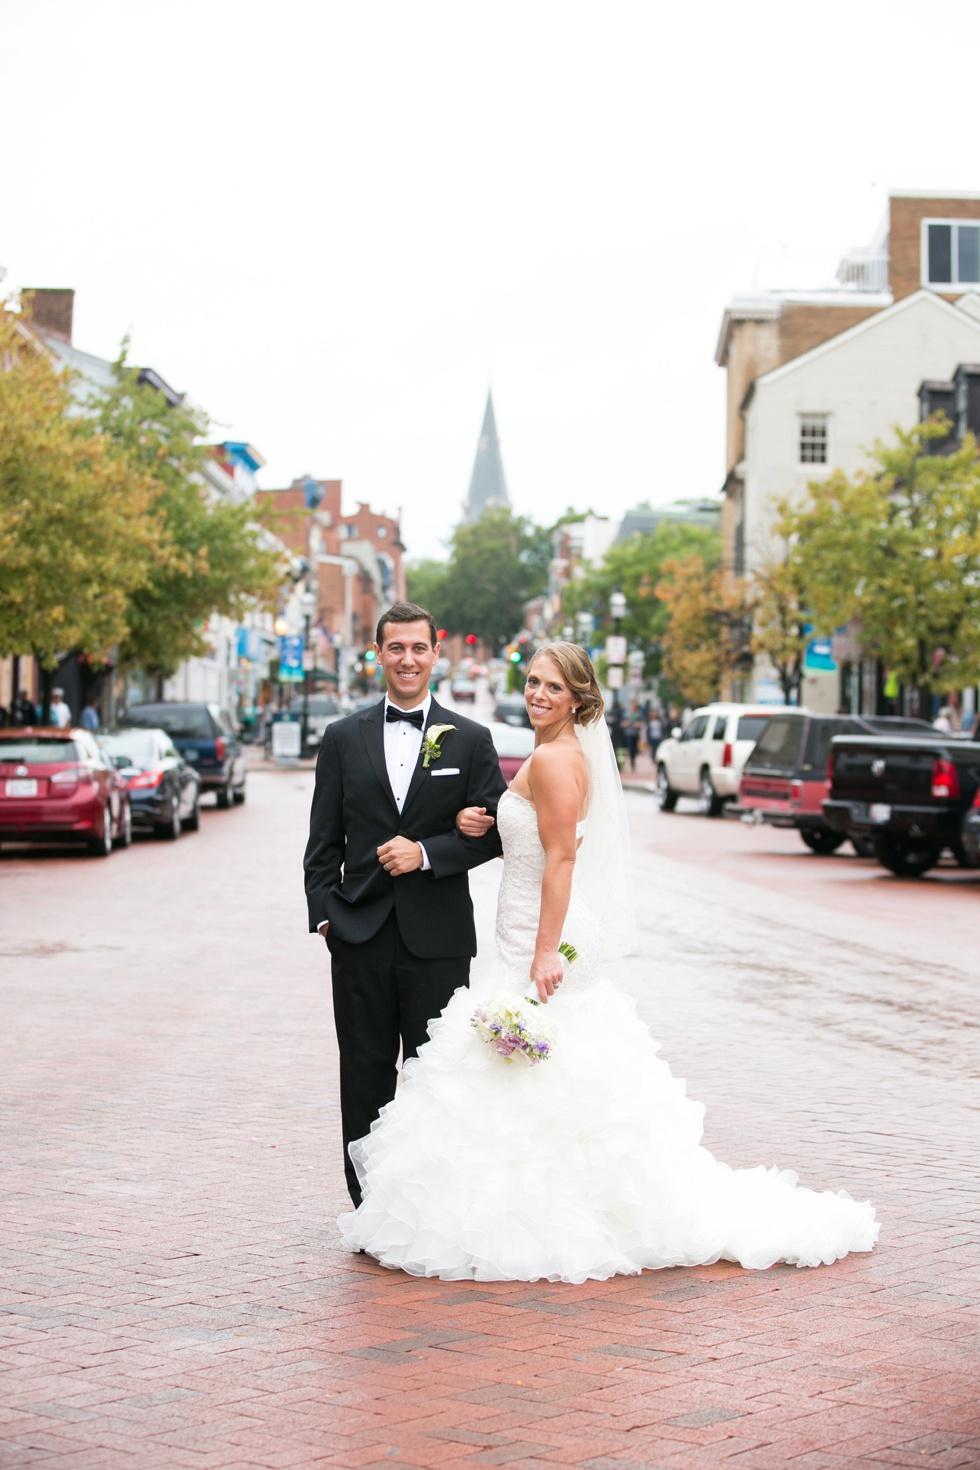 Downtown Annapolis wedding - Best Wedding photographer of 2015